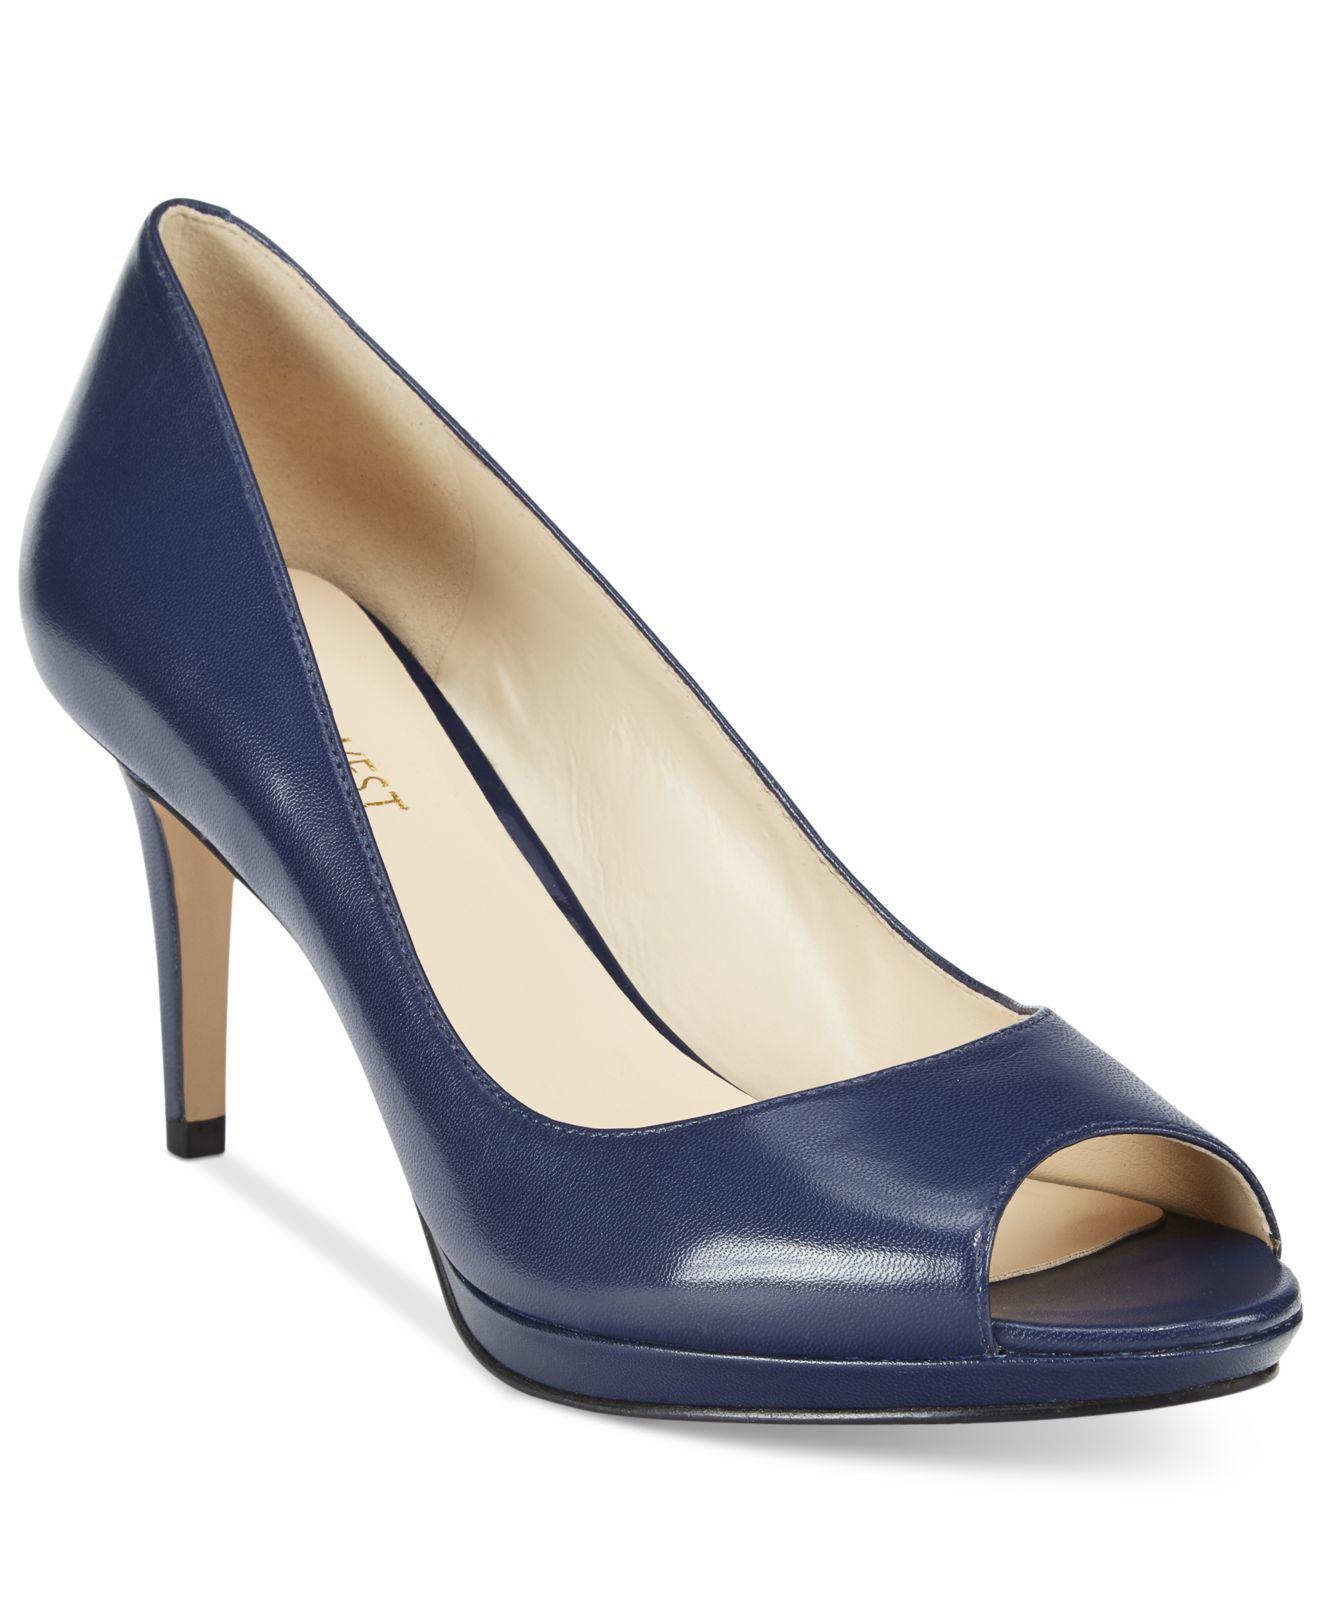 Nine West Blue Peep Toe Shoes